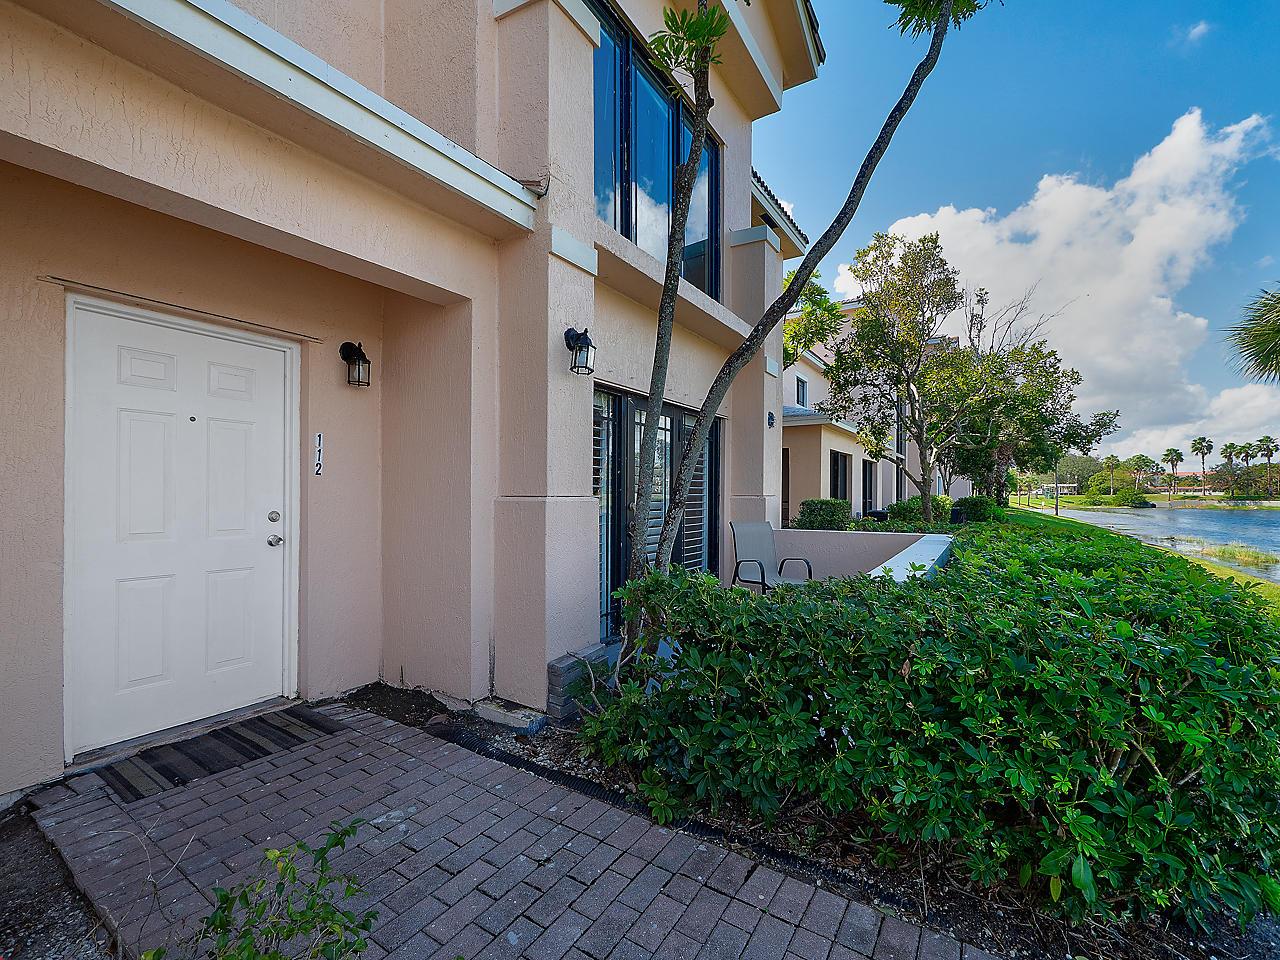 San Matera, 2917 Tuscany Unit 112, Palm Beach Gardens, Florida 33410